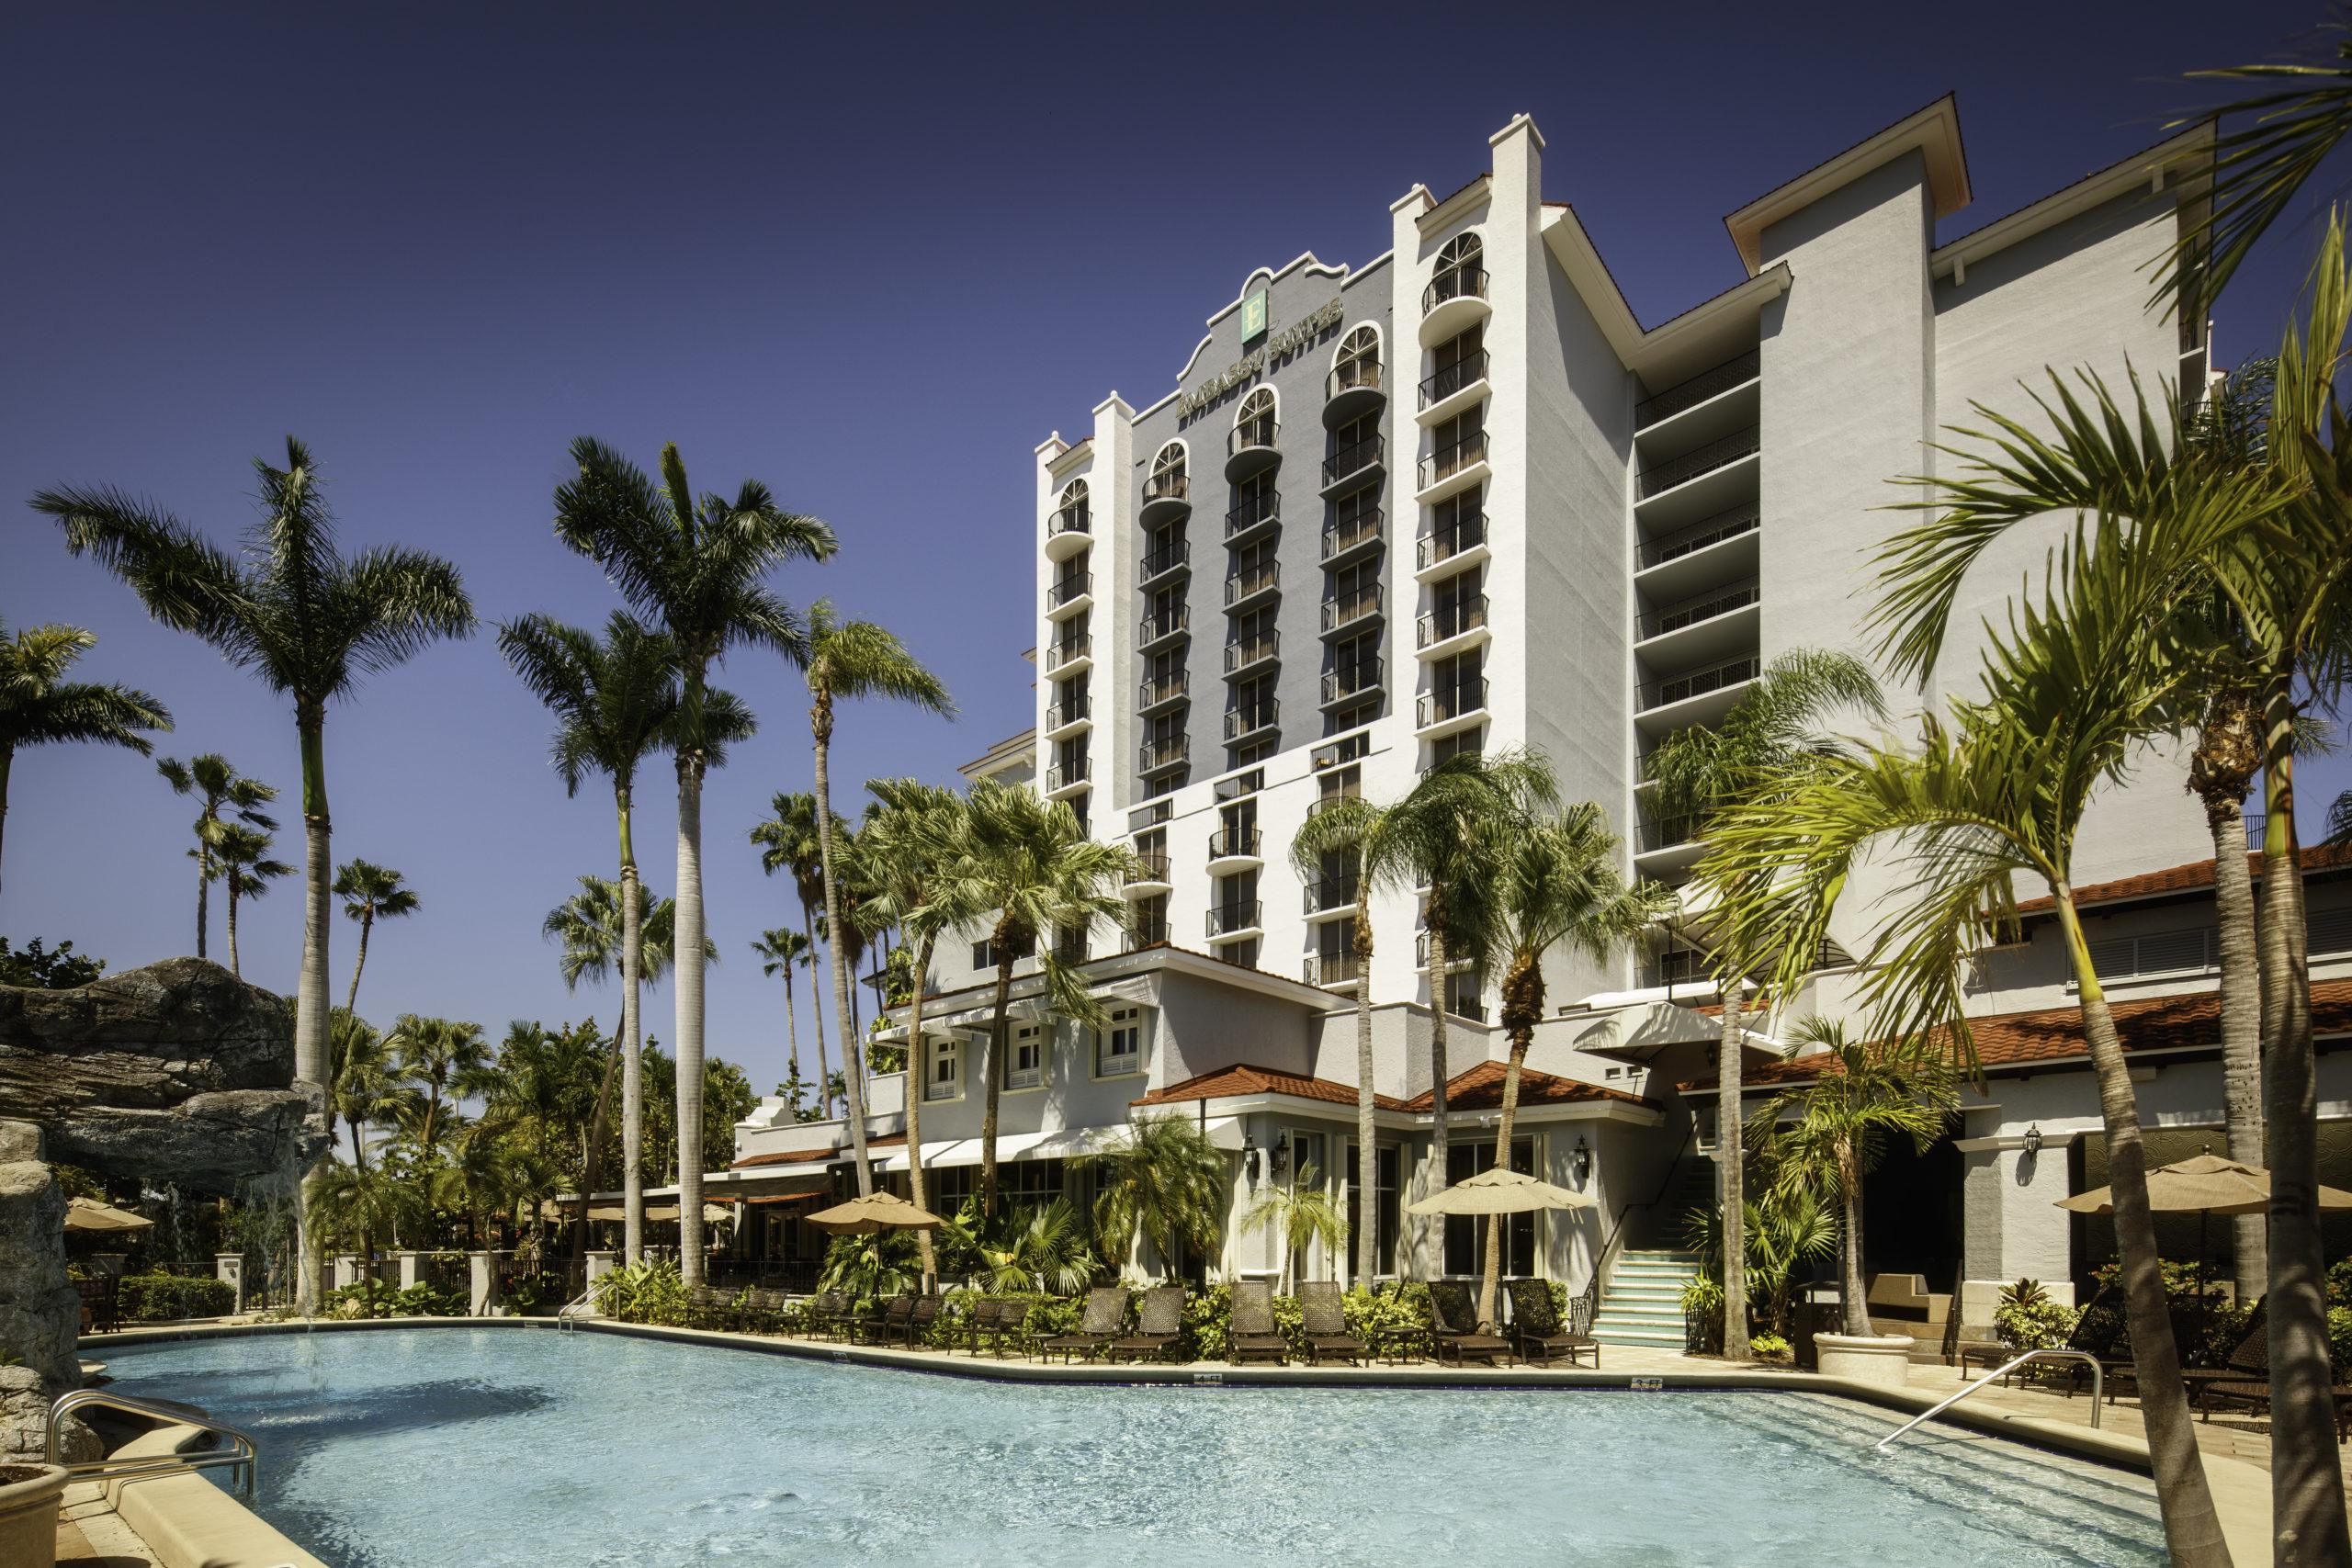 Embassy Suites Fort Lauderdale 17th Street Pool